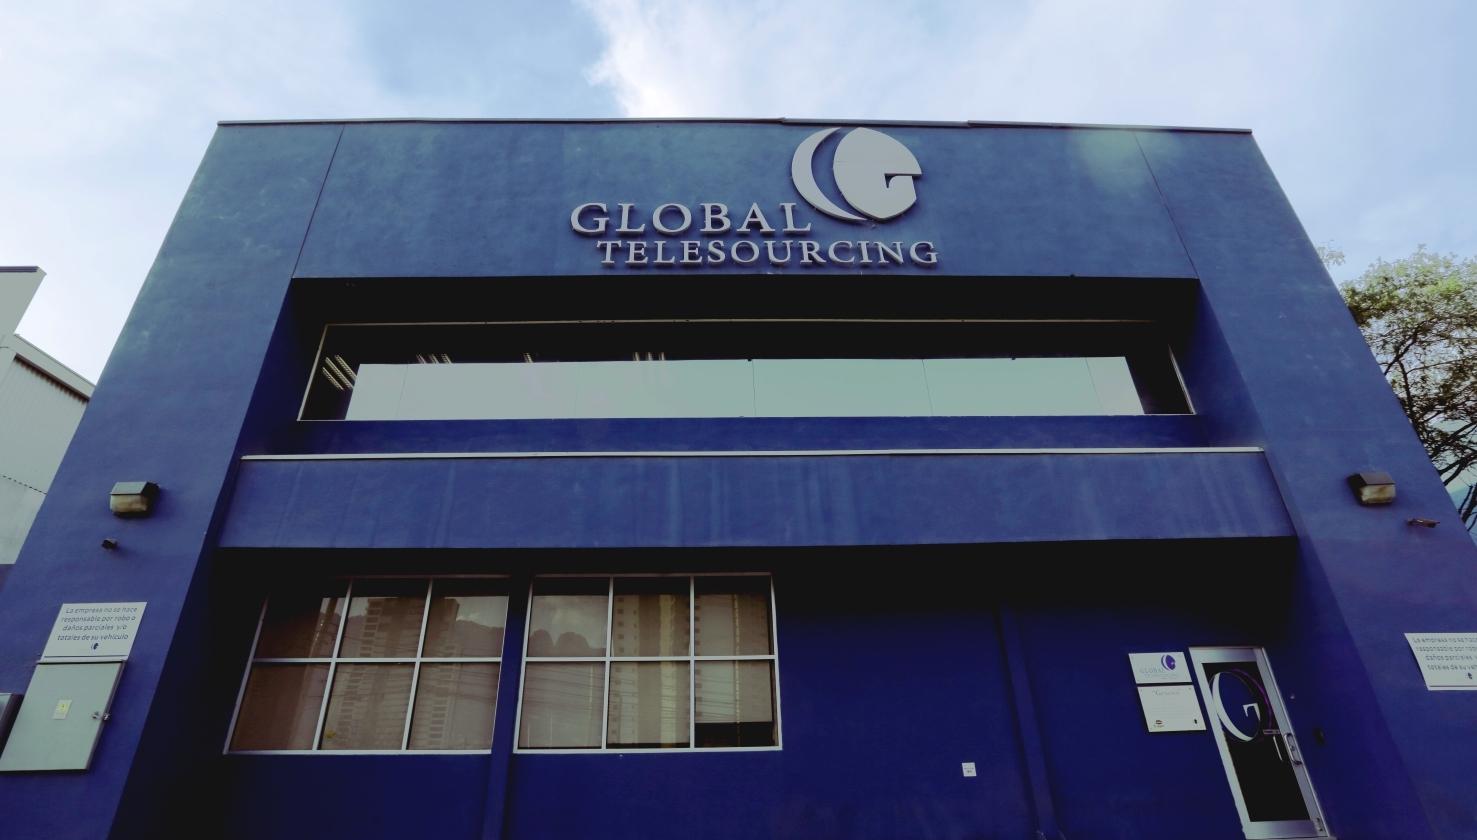 global telesourcing